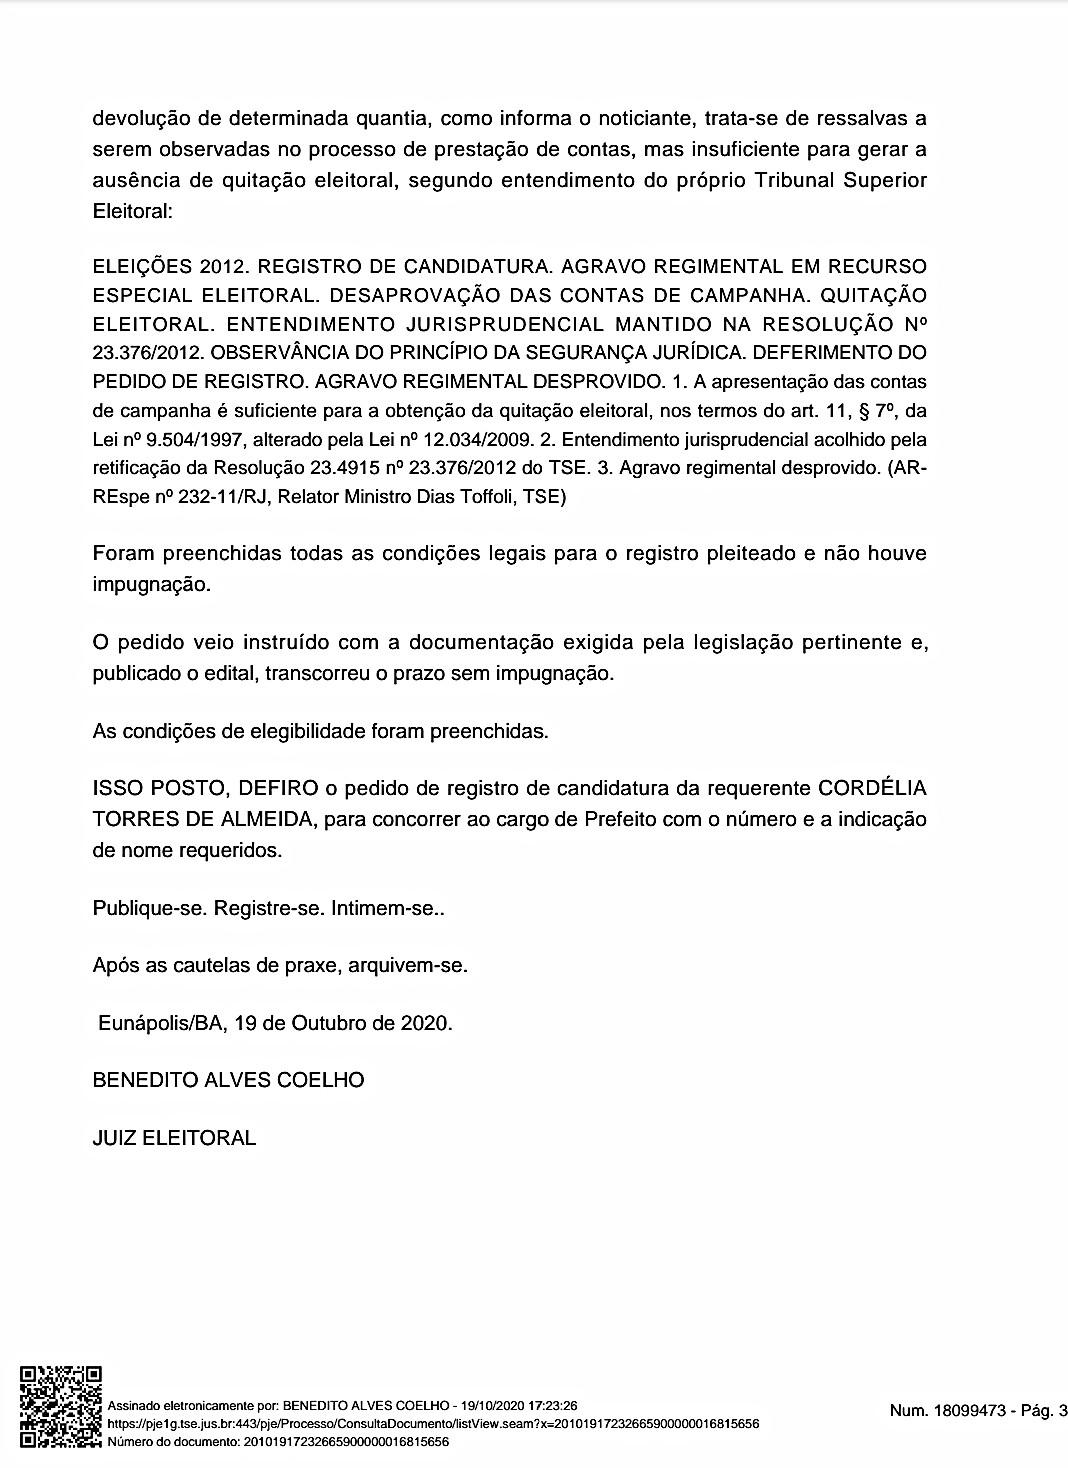 É DEFINITIVO: Juiz Eleitoral considera Cordélia apta para concorrer ao cargo de prefeita 33